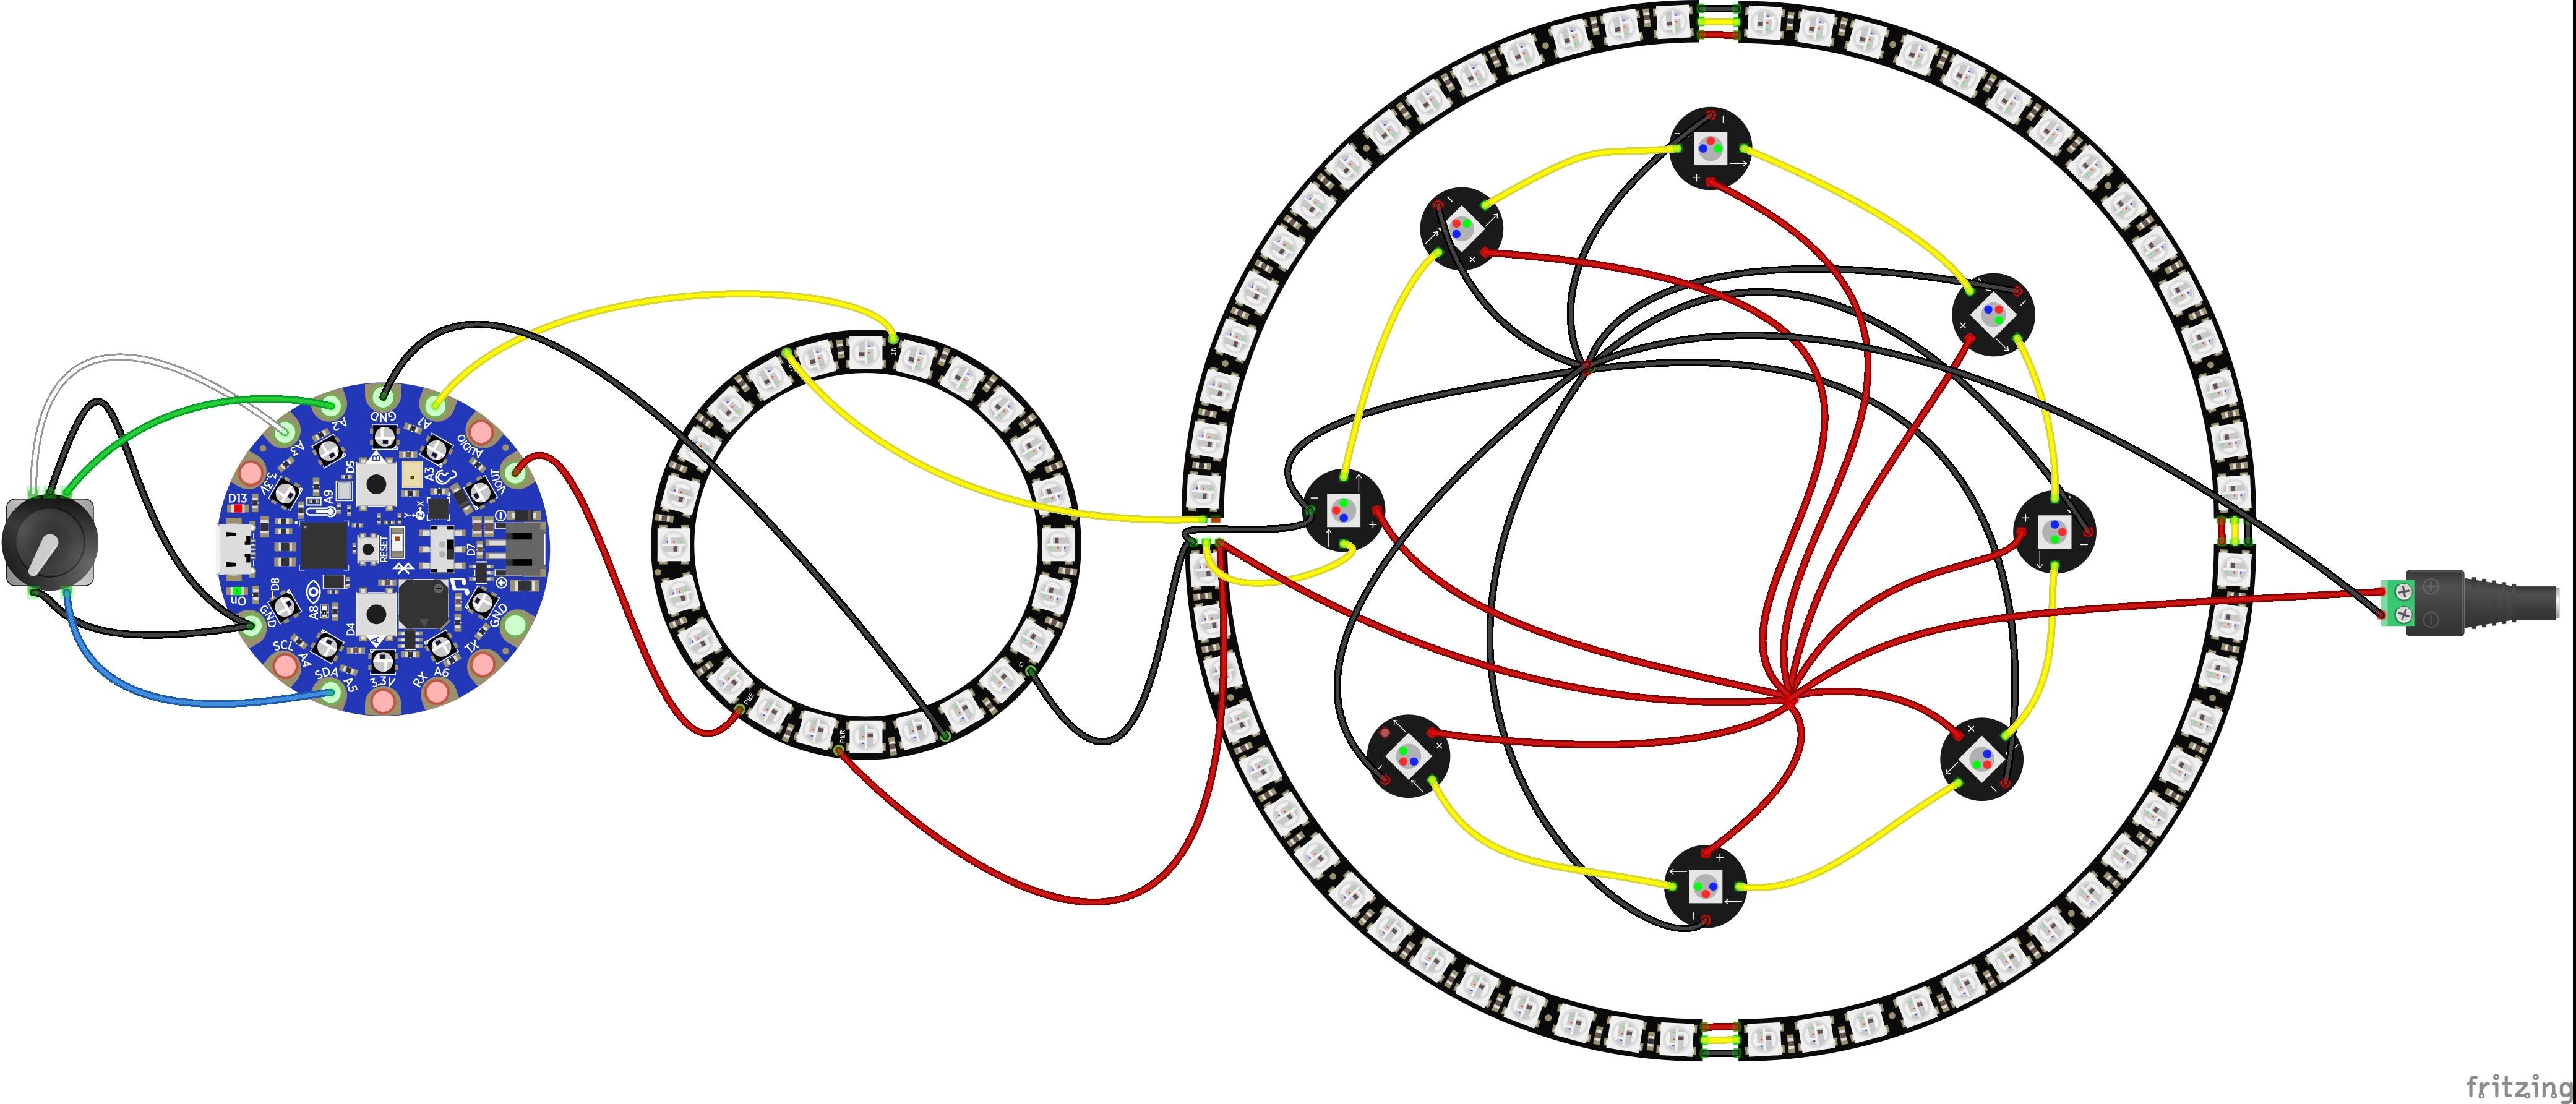 led_pixels_chandelier_wiring2_bb.jpg